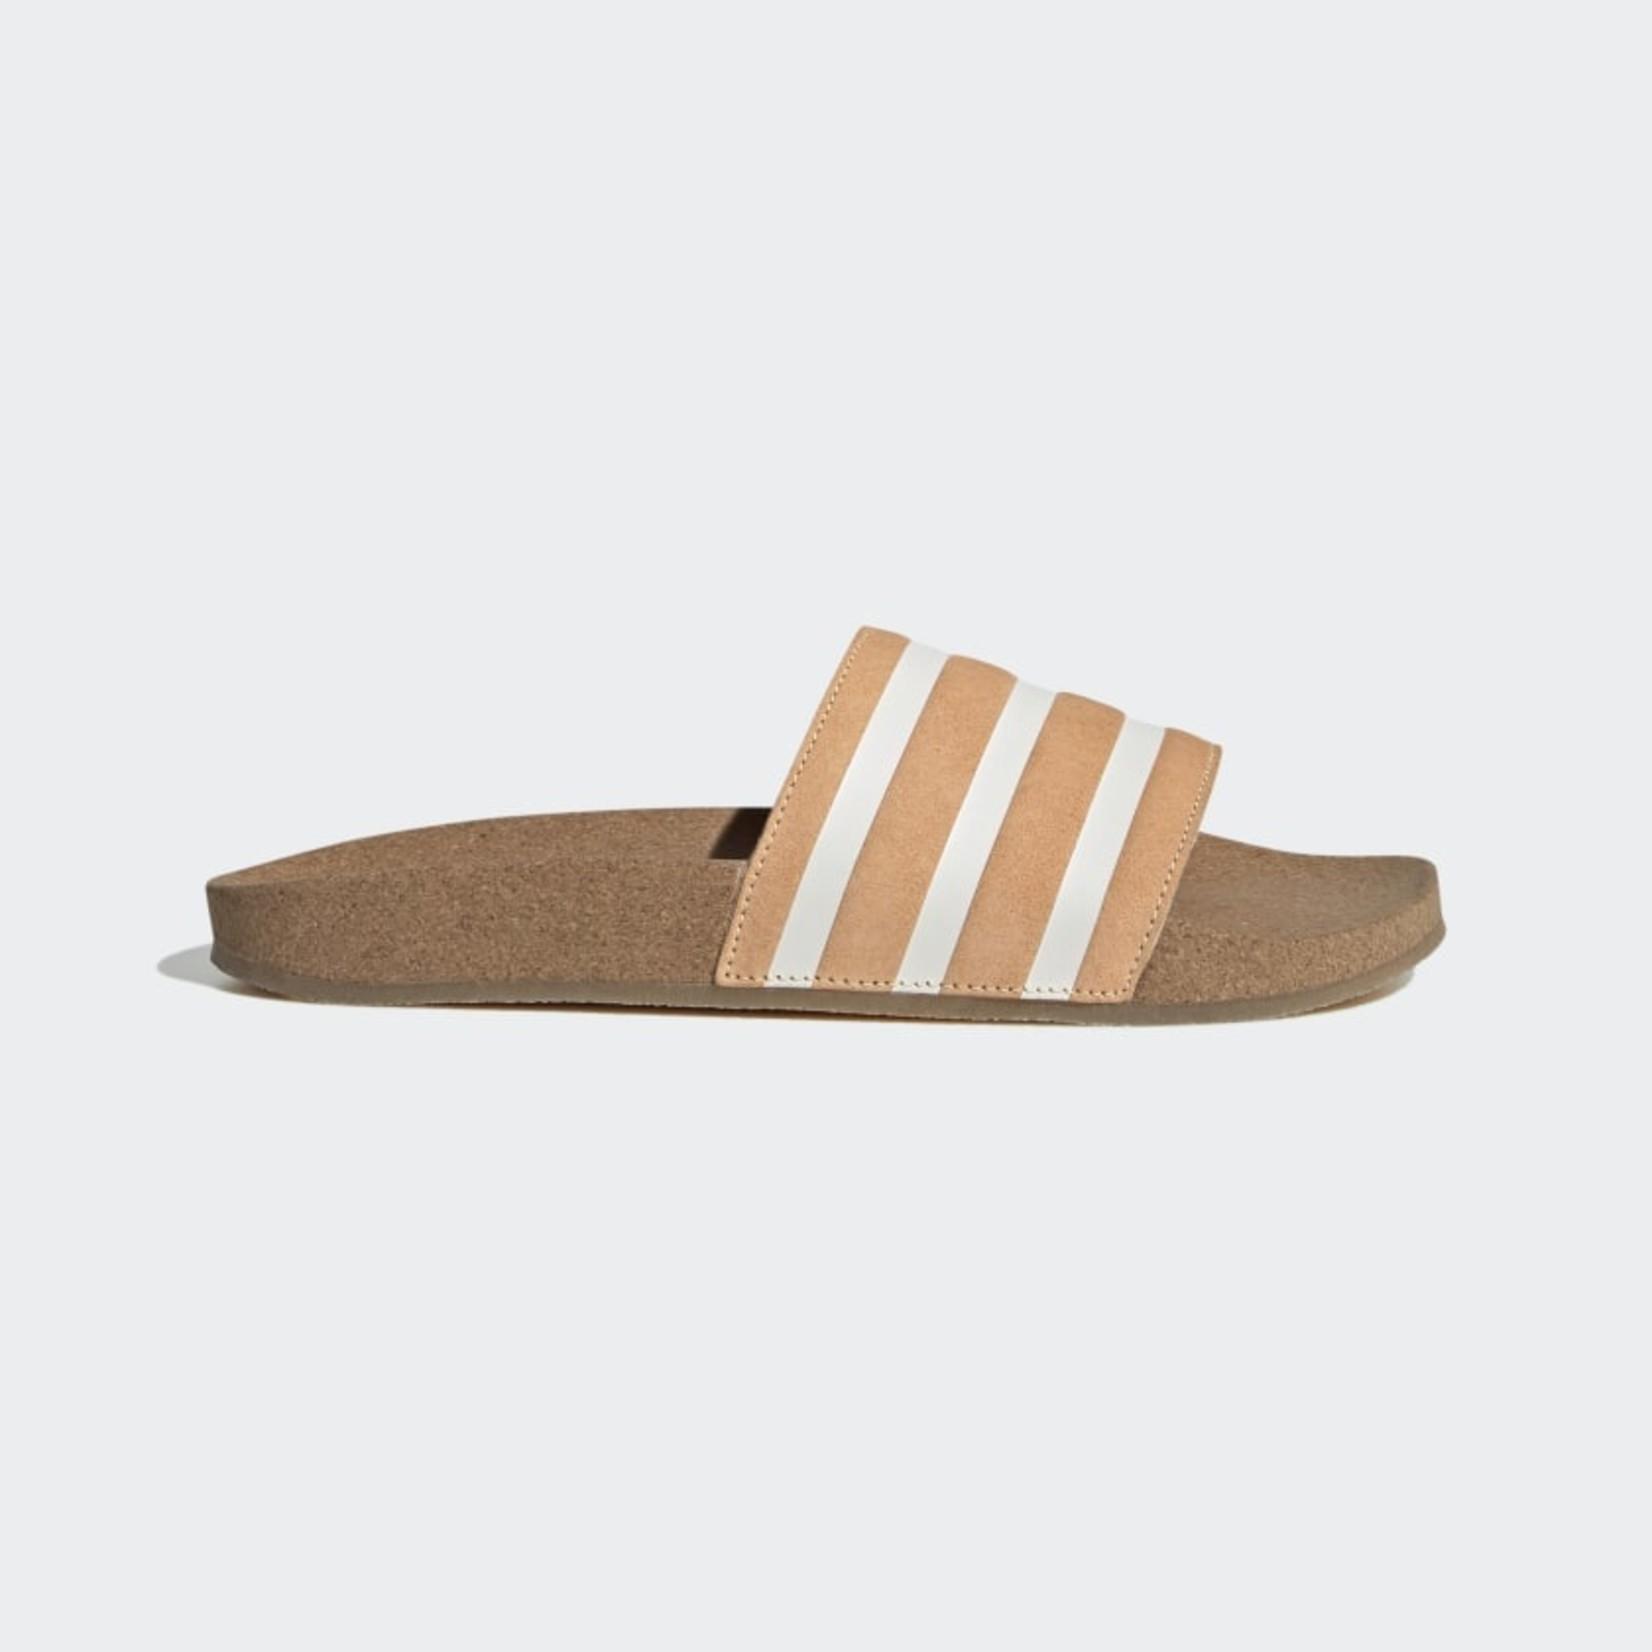 Adidas Adilette W Aciora/Cwhite